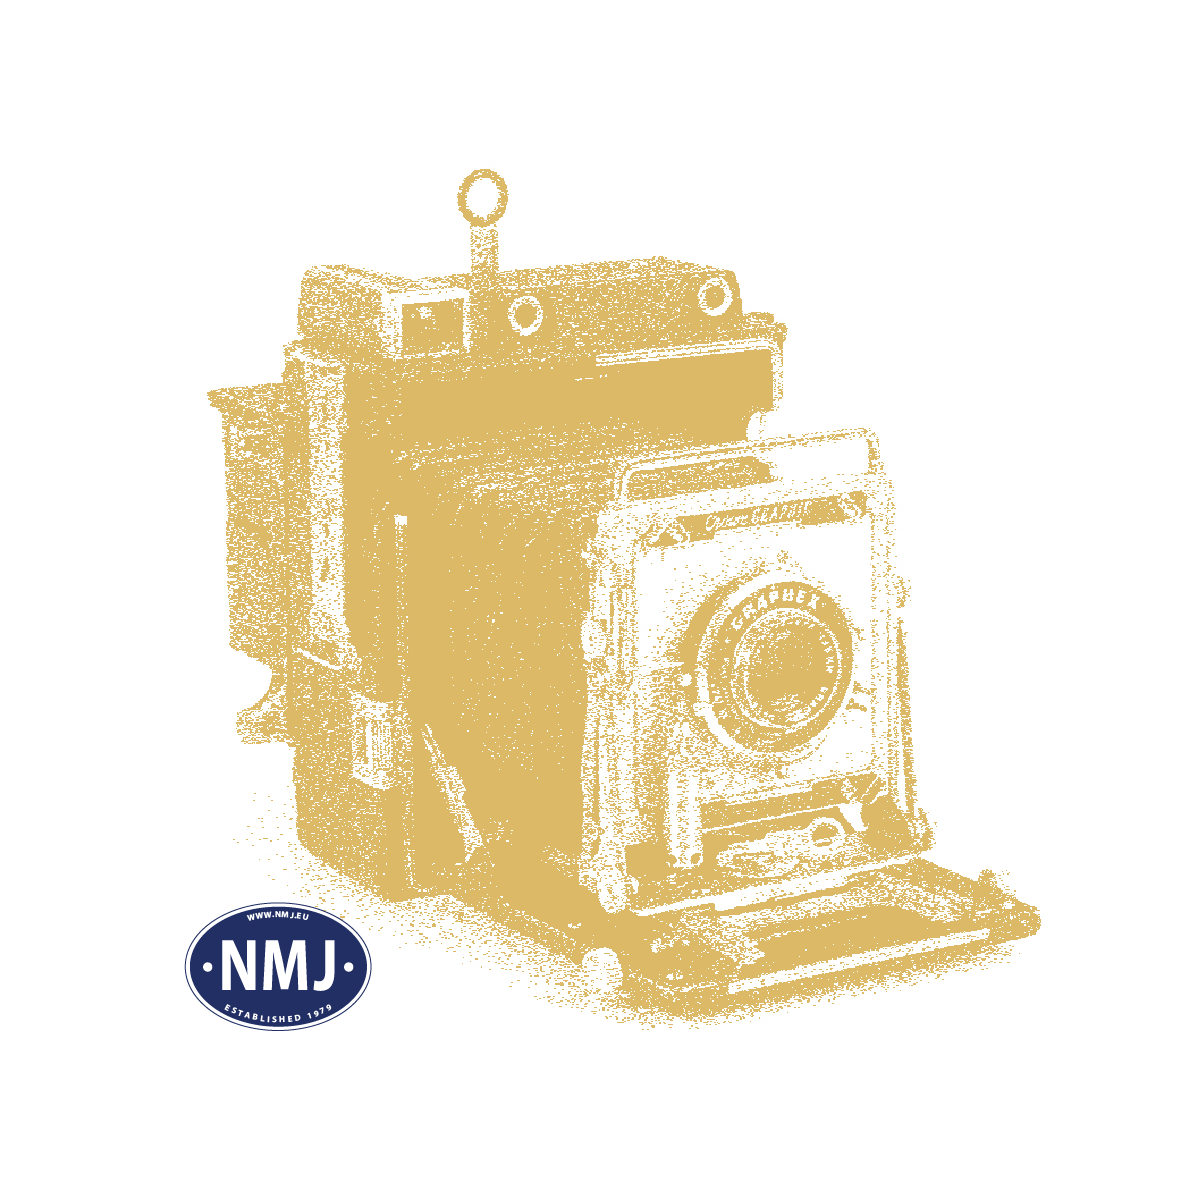 ESU59610 - Lokpilot Dekoder V5, NEM 652